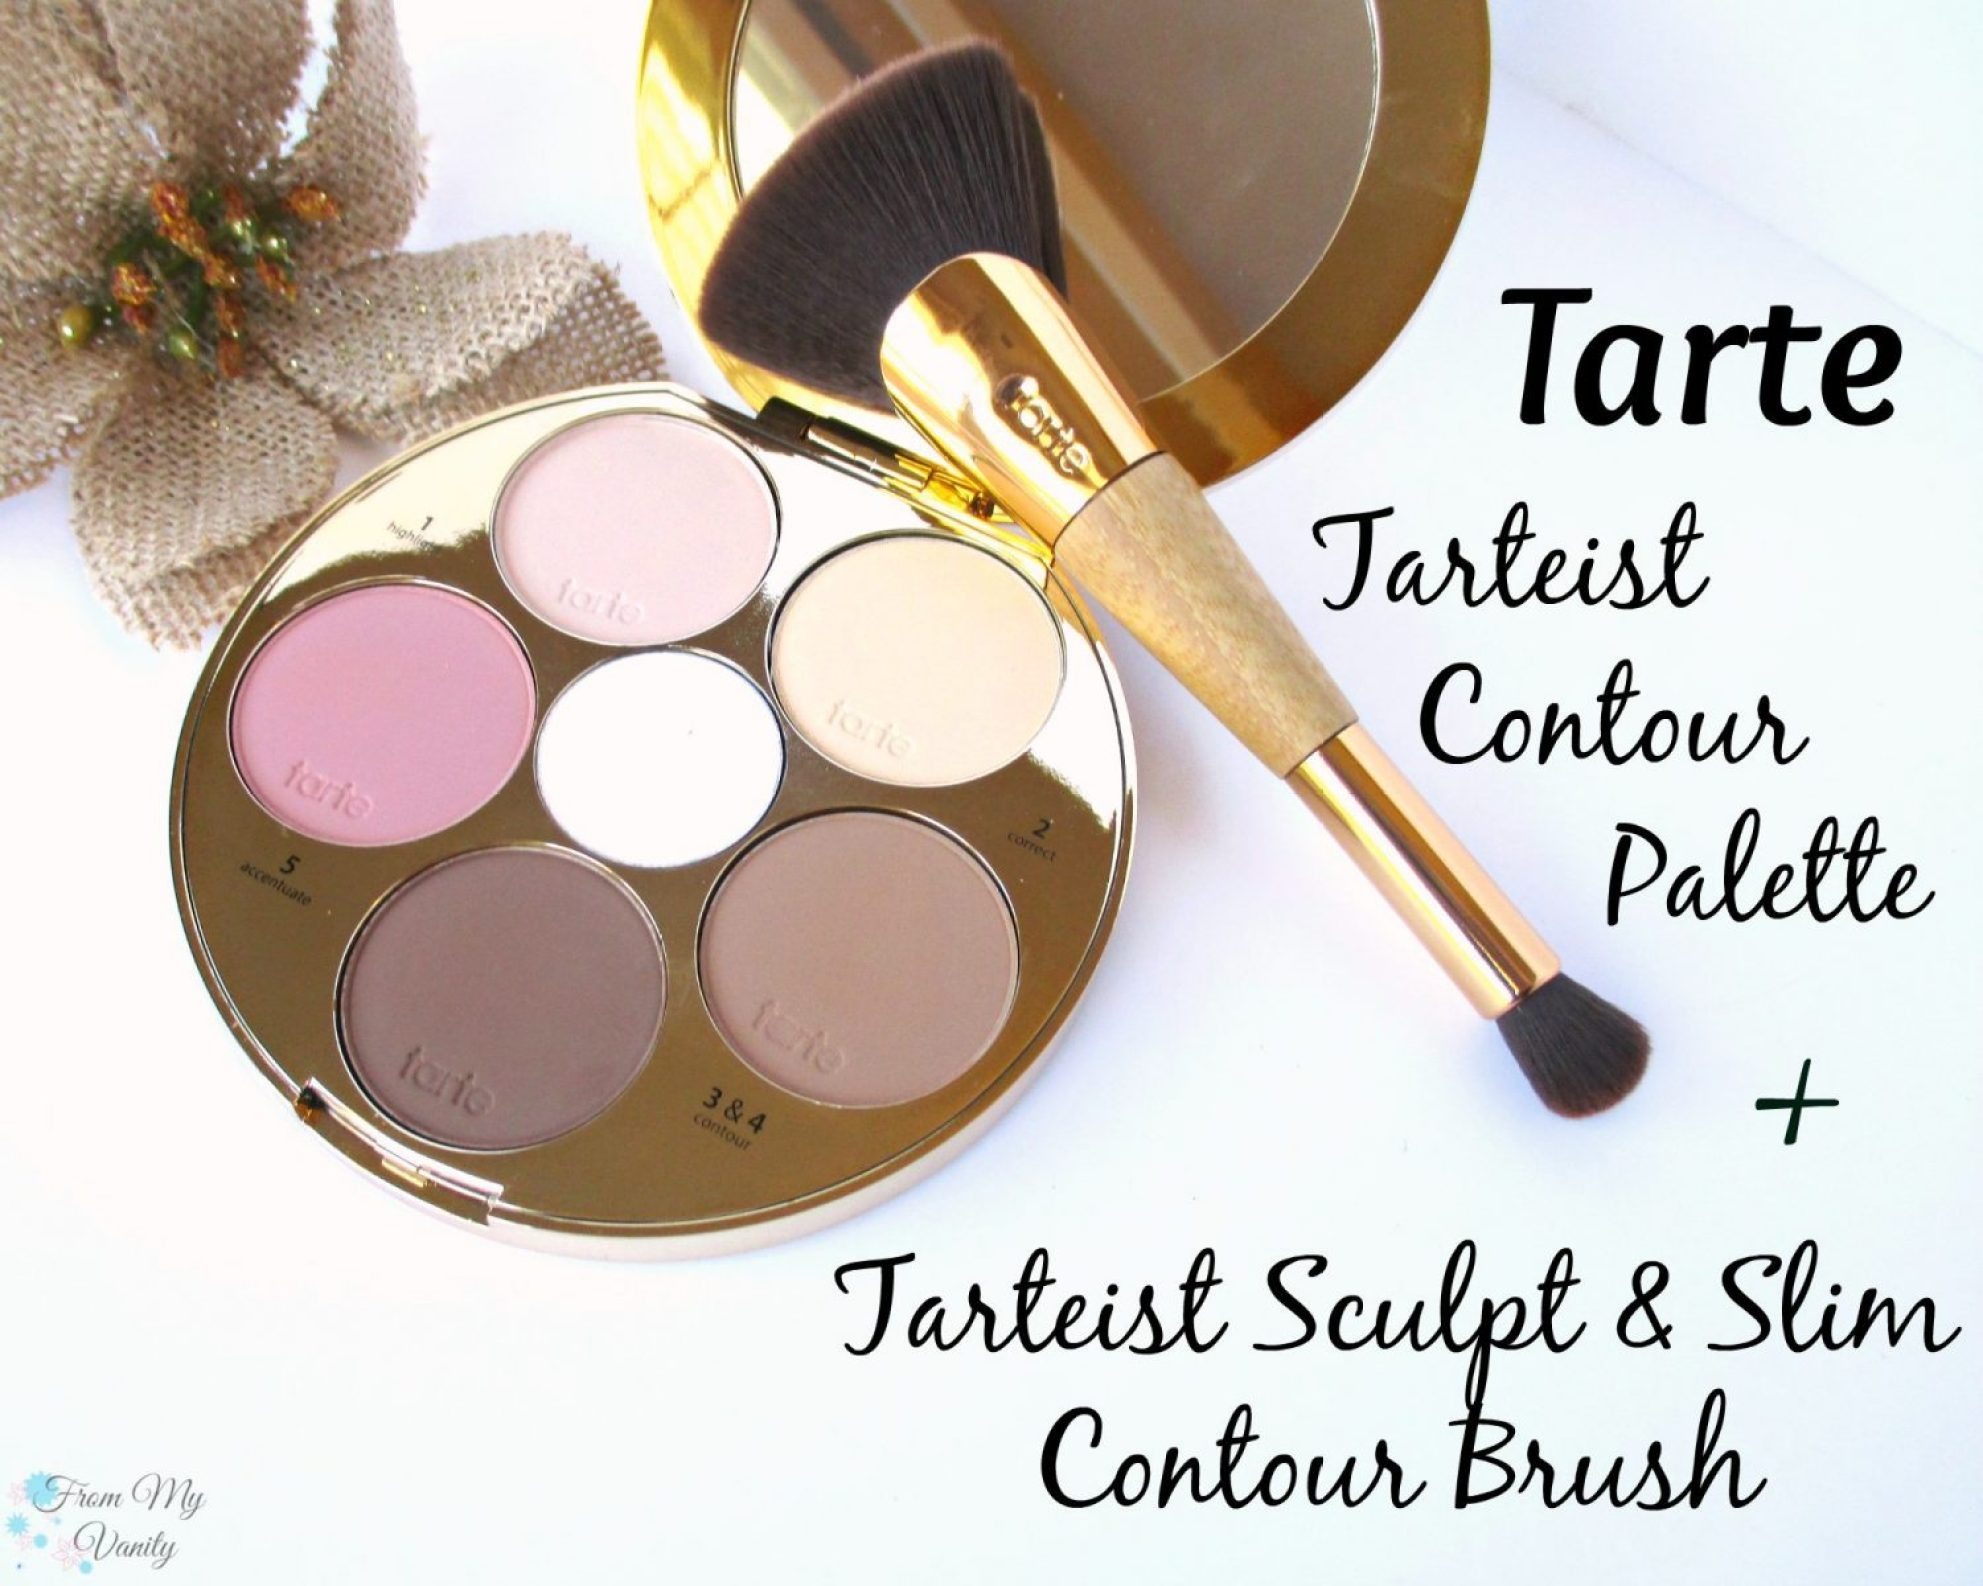 Tarte Tarteist Contour Palette // Tarteist Sculpt & Slim Contour Brush // Review & Swatches // #TarteCosmetics @LadyKaty92